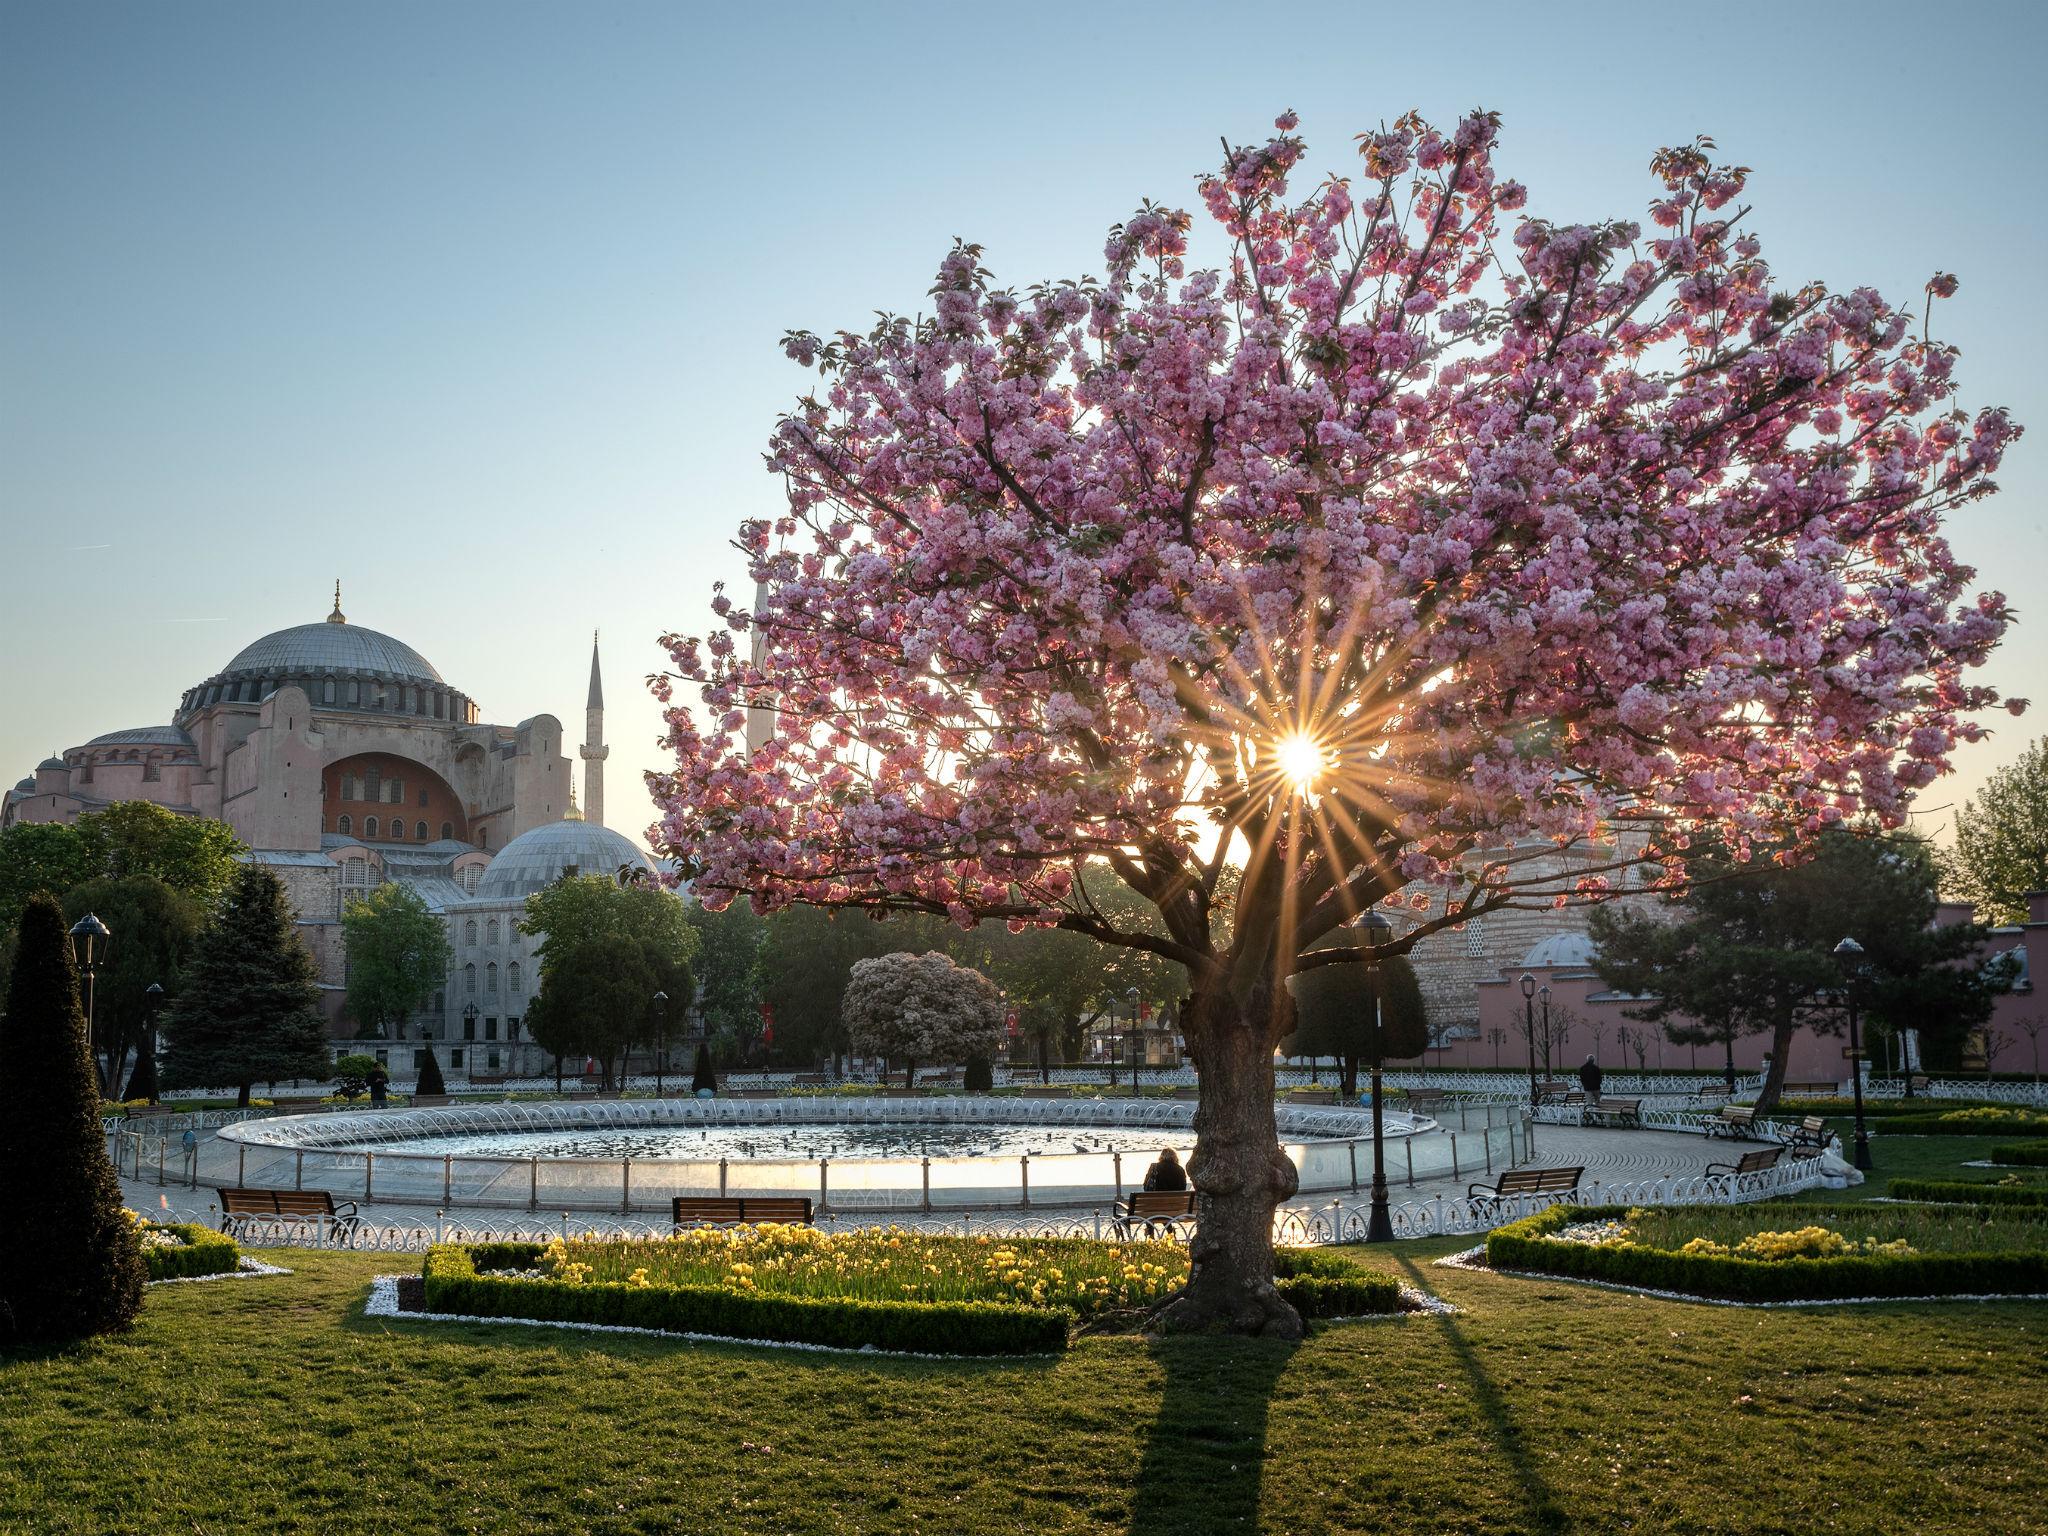 Cherry blossom in Istanbul, Turkey